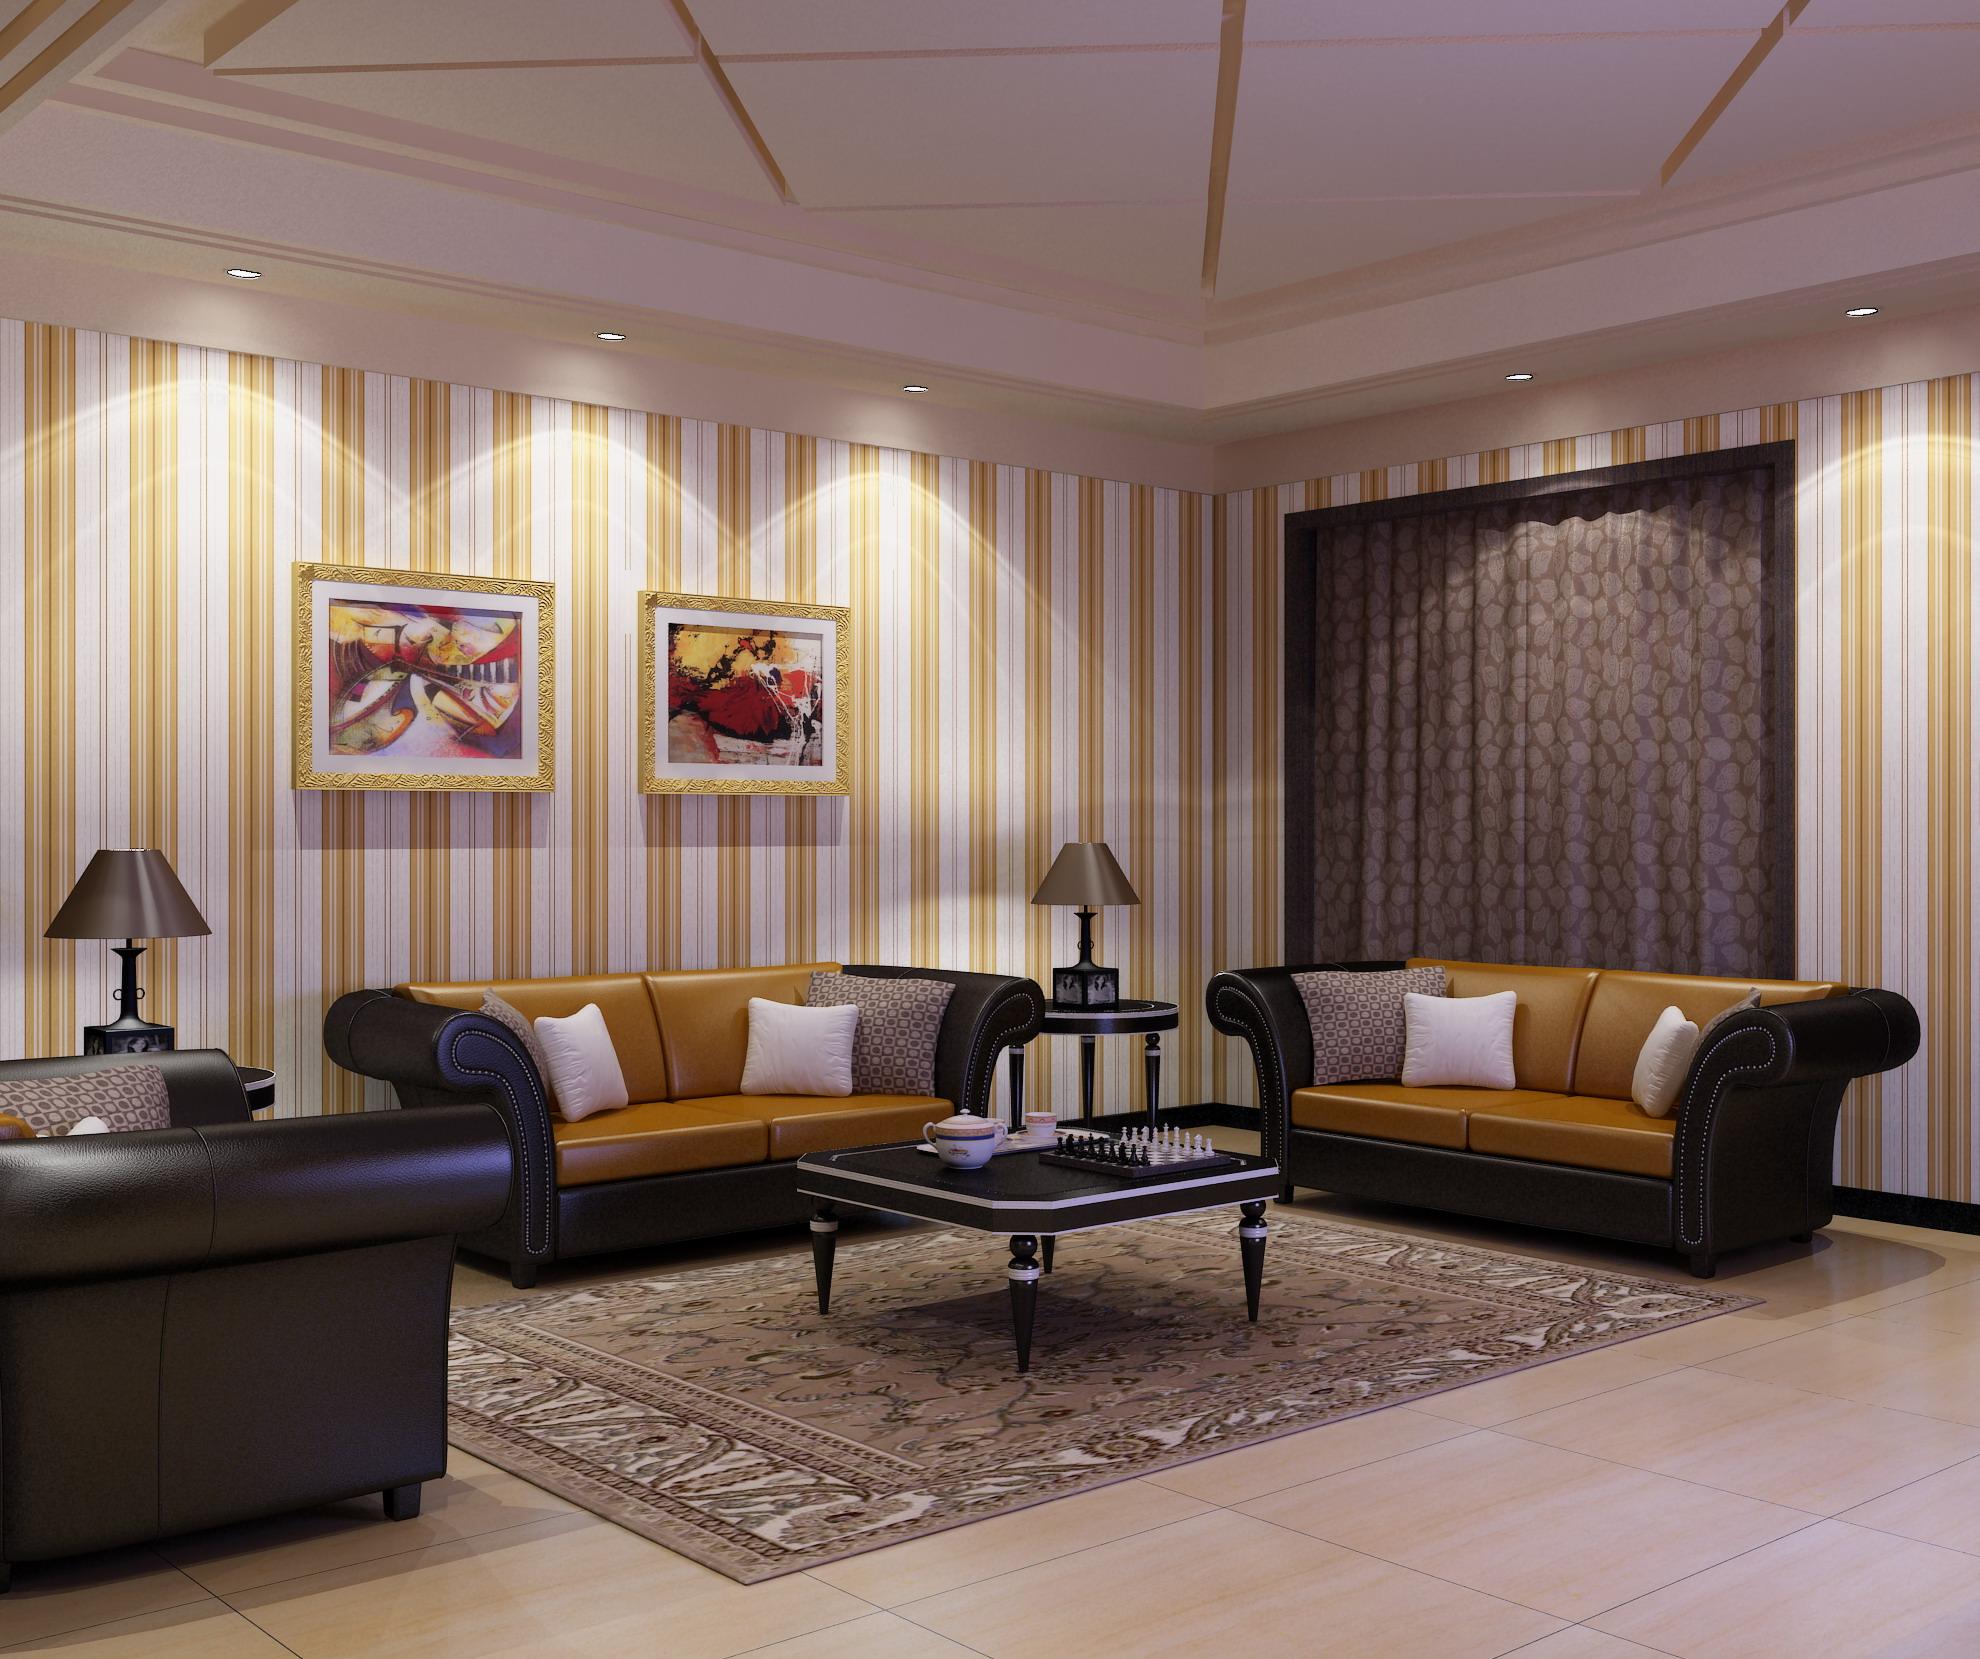 living room 1006 3d model buy living room 1006 3d model flatpyramid. Black Bedroom Furniture Sets. Home Design Ideas